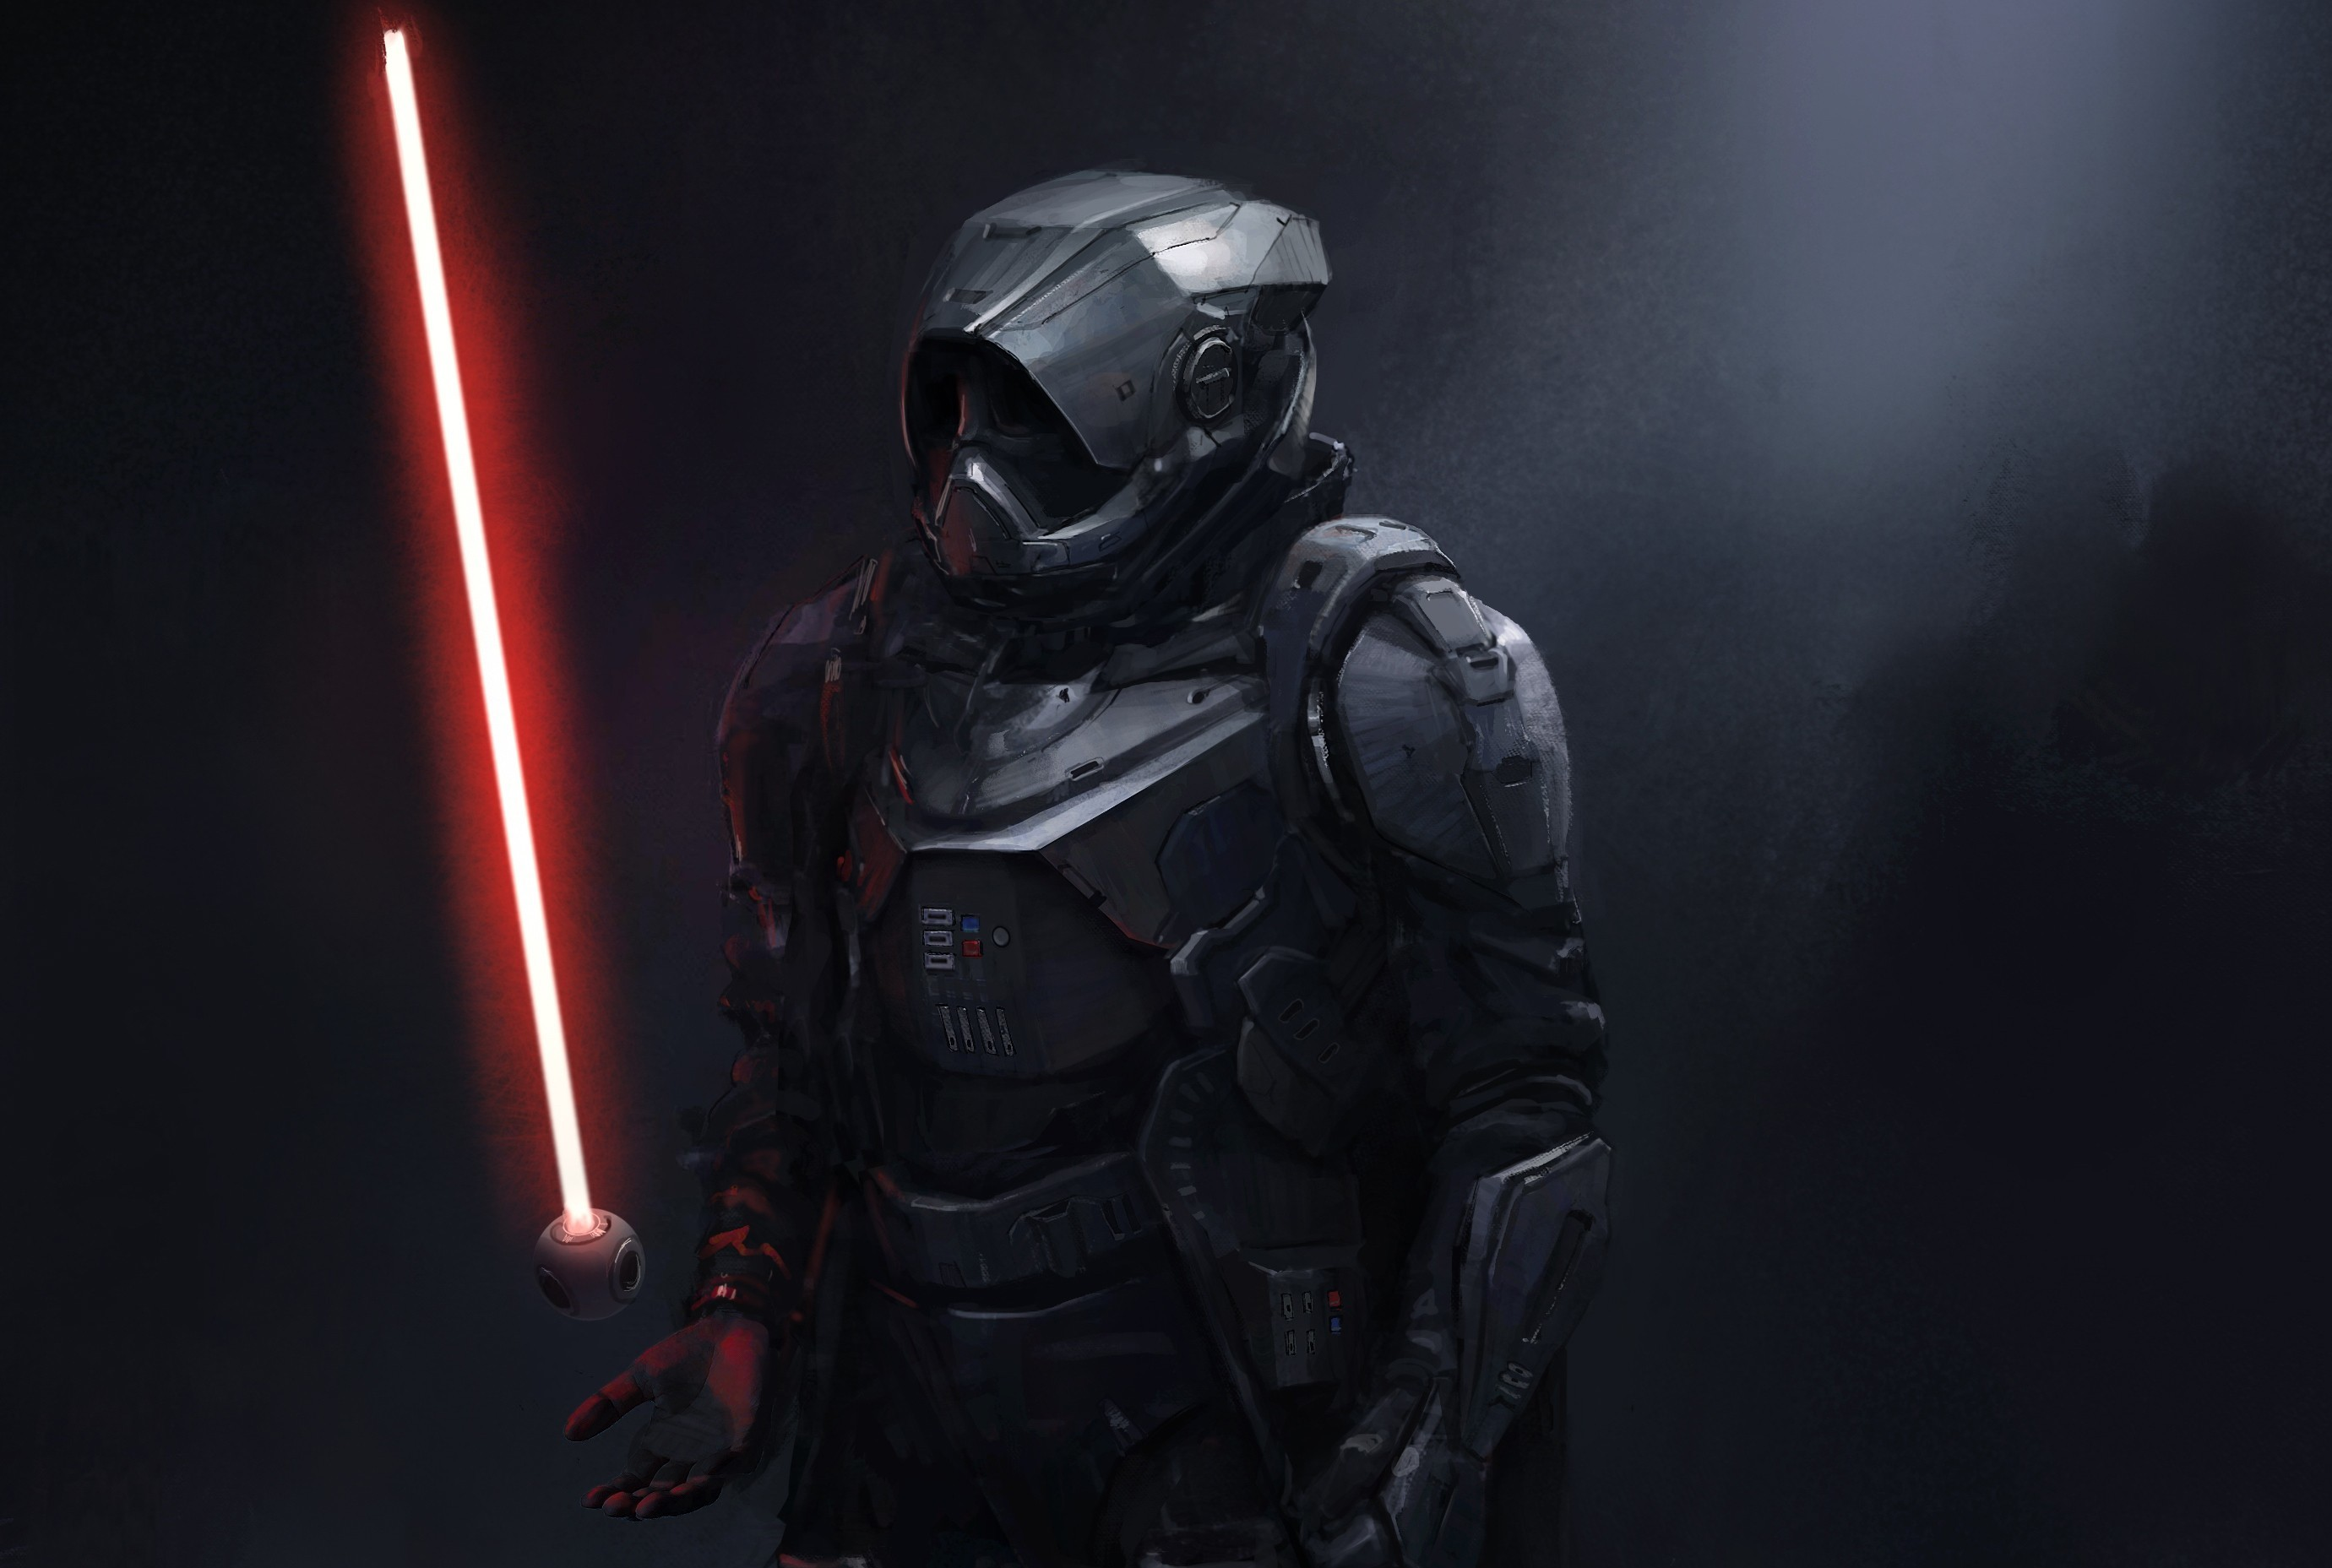 Sci Fi Star Wars Sith Star Wars Lightsaber Red Wallpaper